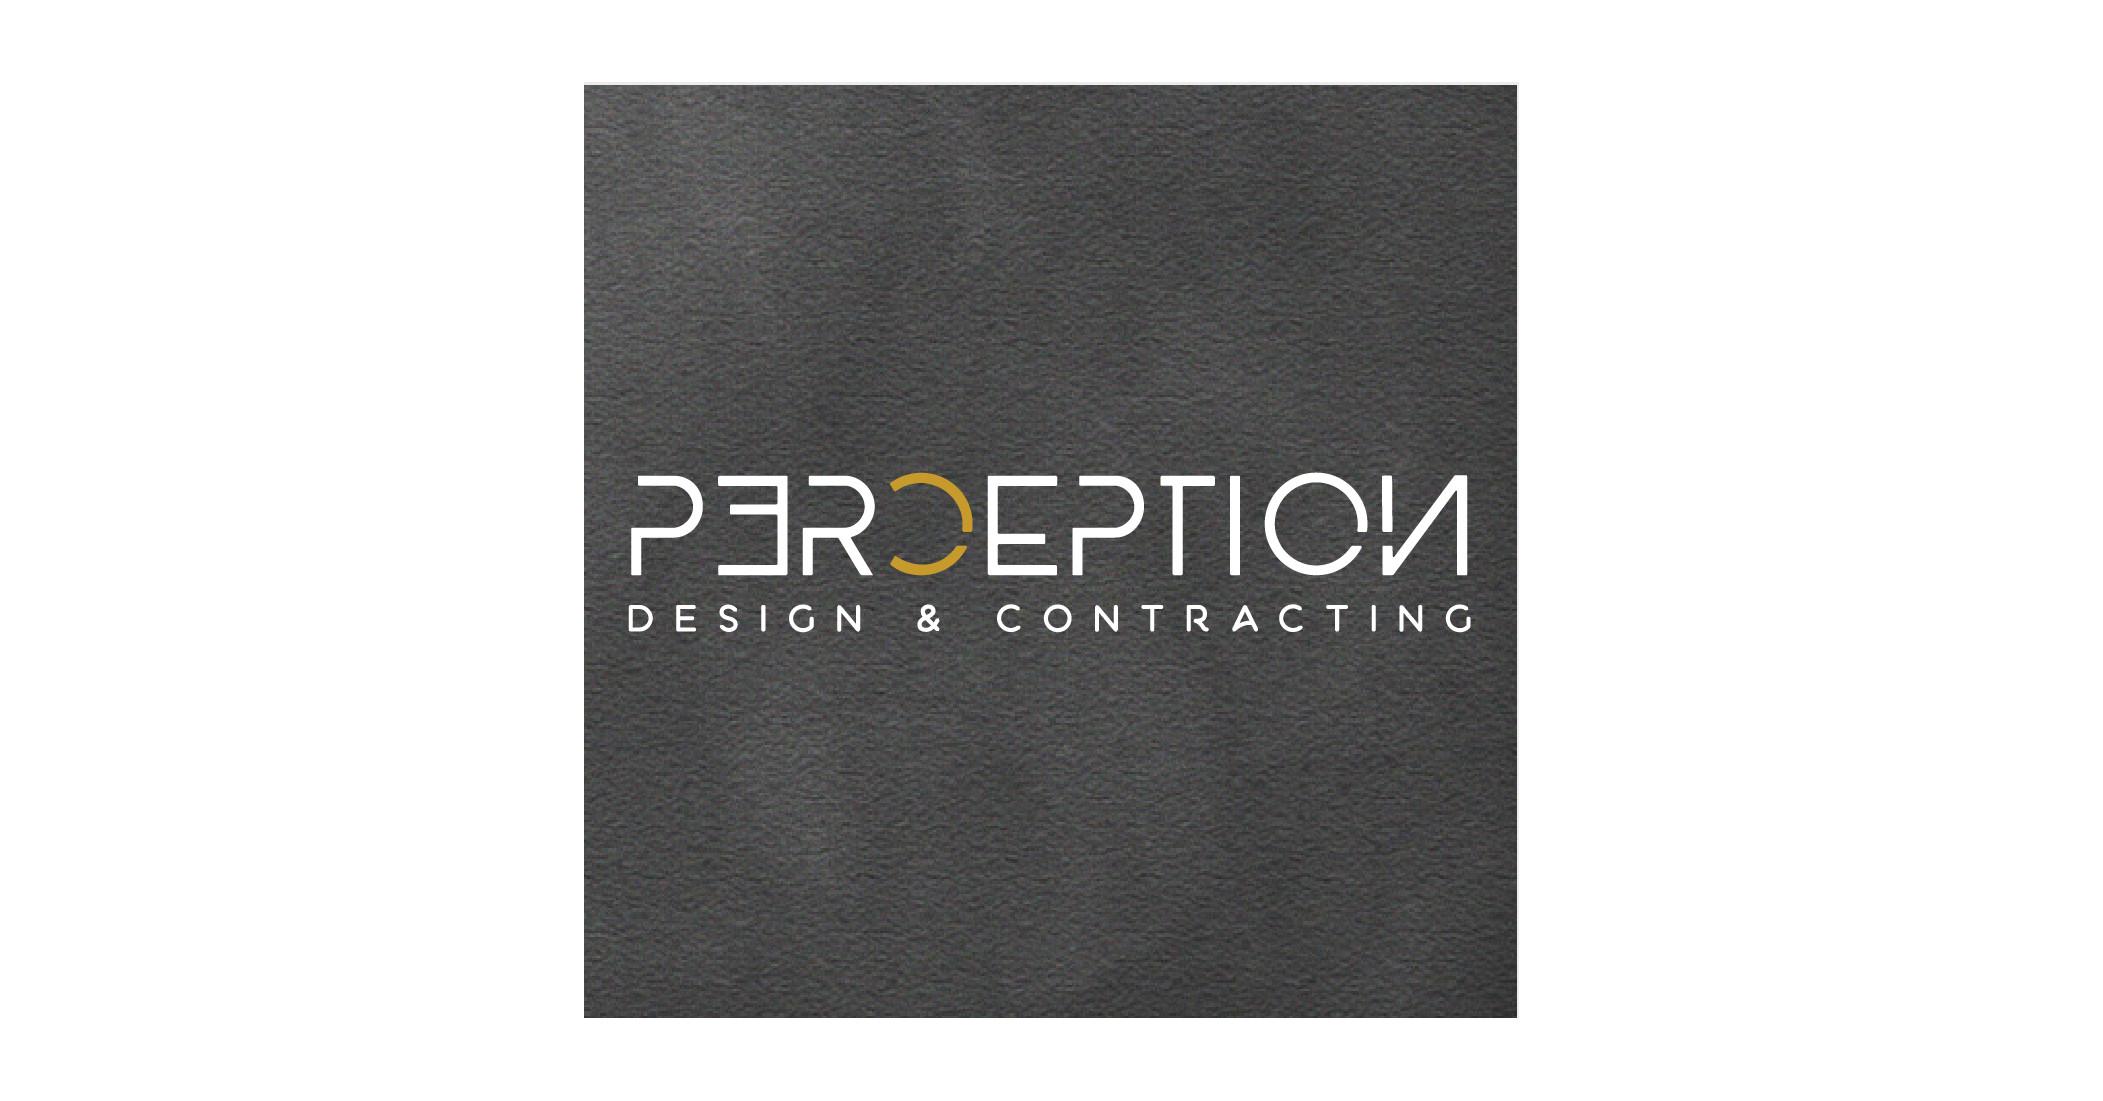 صورة Job: Interior Designer at Perception for Design & Contracting in Cairo, Egypt